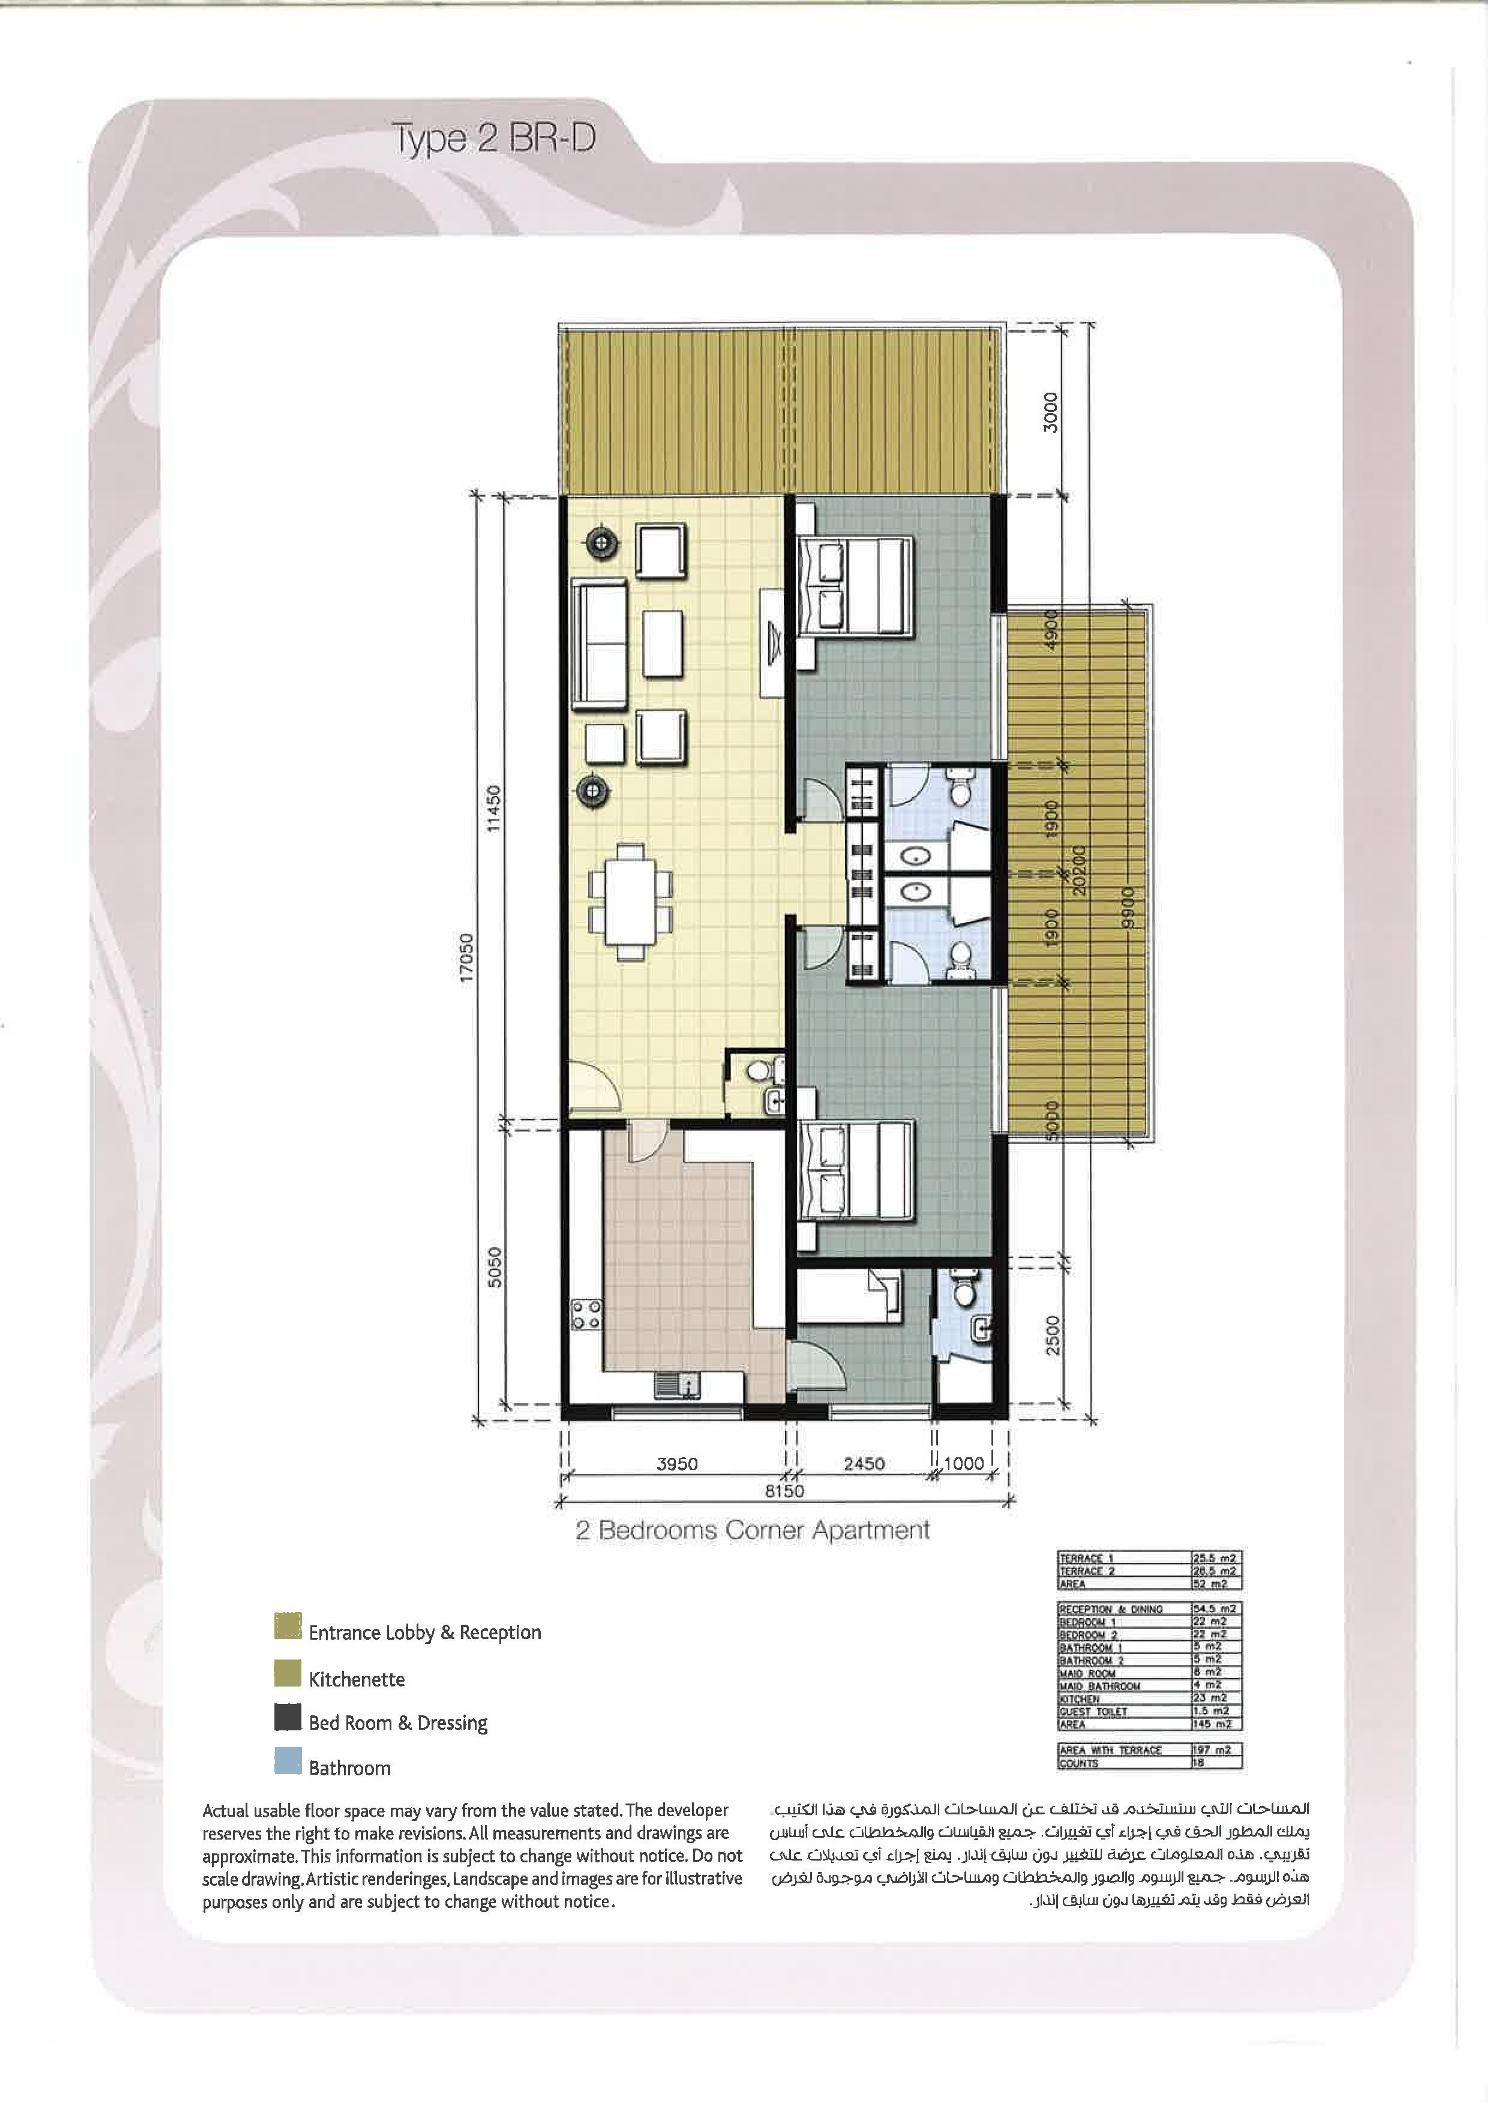 Azure Residence Floor Plans Palm Jumeirah Dubai Floor Plans Palm Jumeirah Flooring